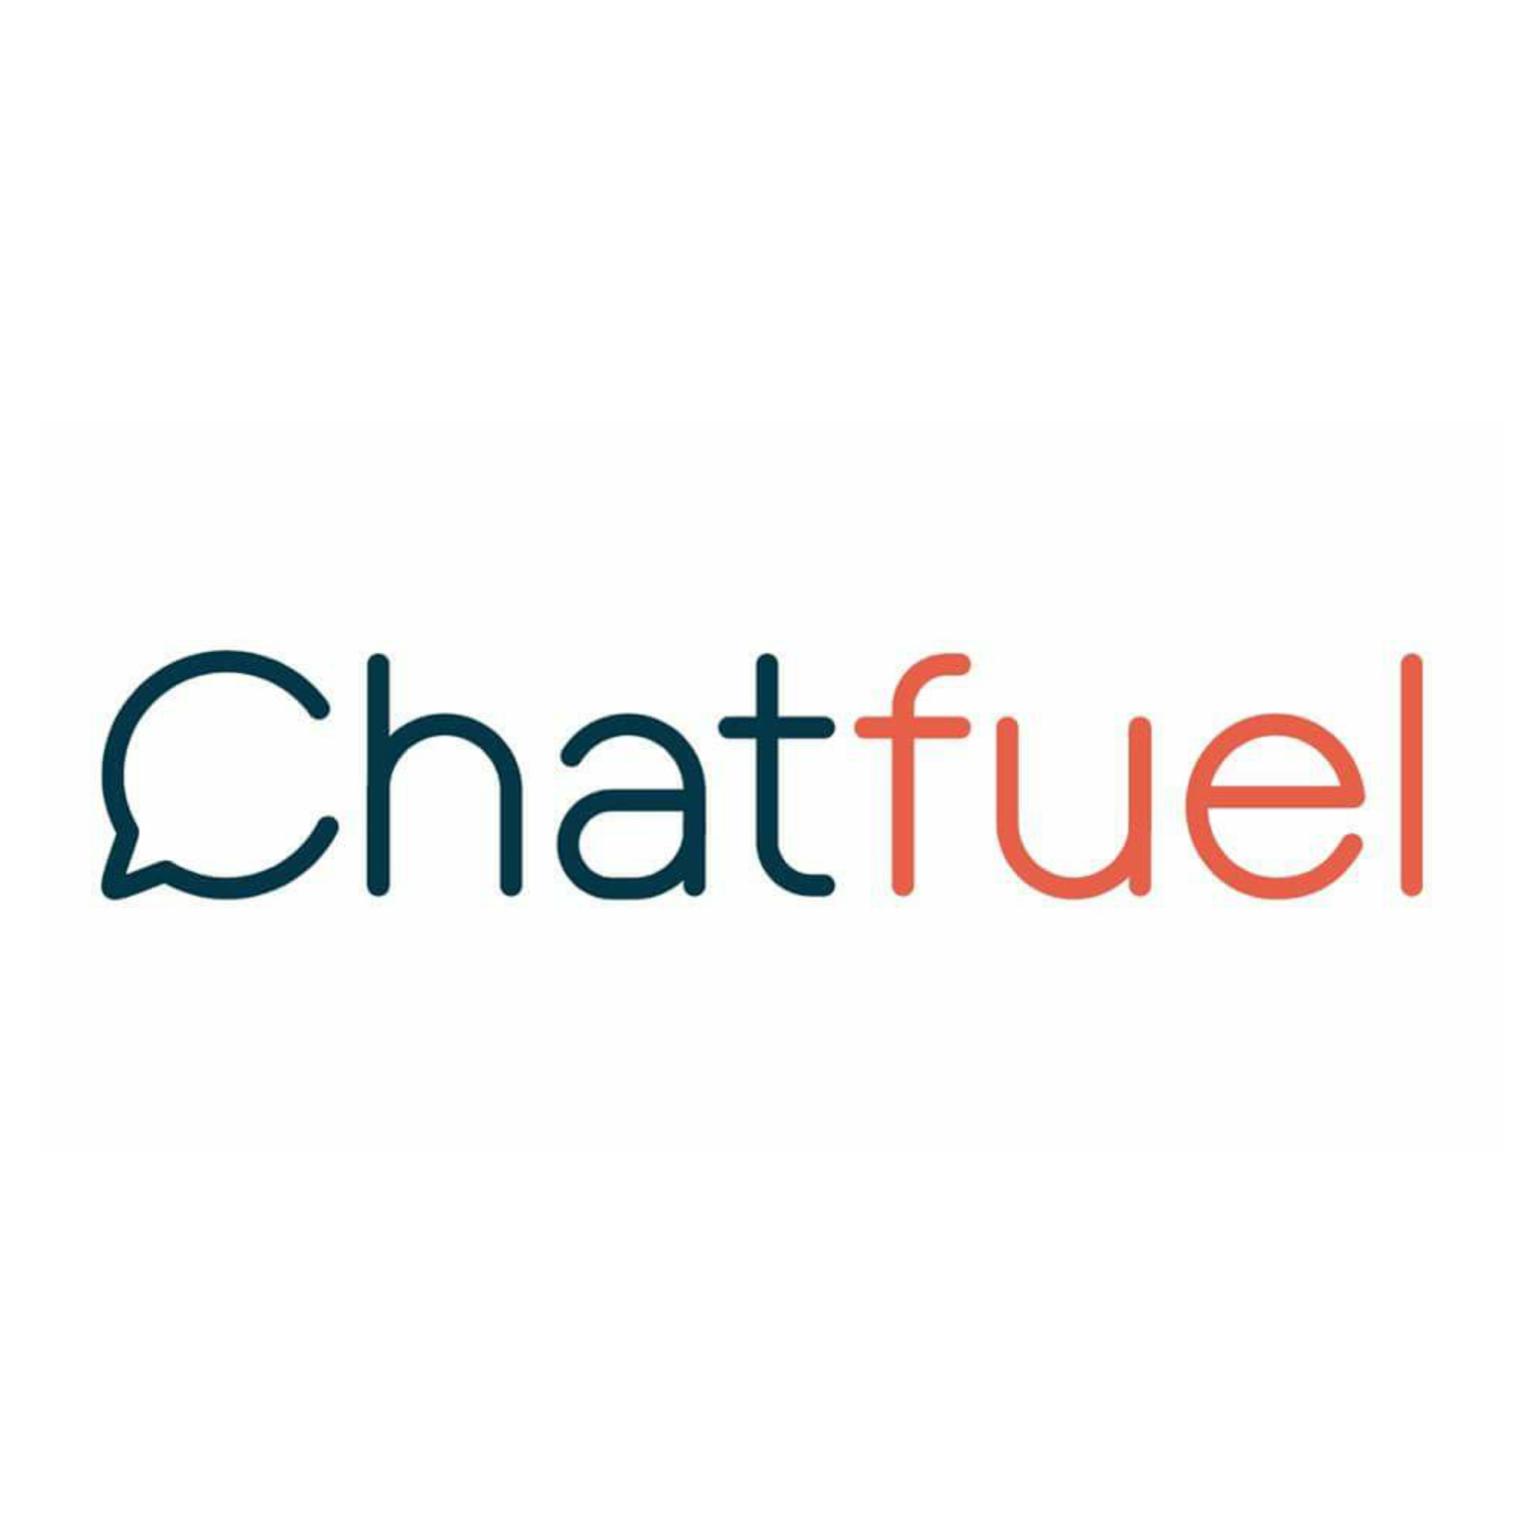 Chatfuel দিয়ে খুব সহজে আপনার ফেসবুক পেজের জন্য Messenger Bot বানান.. [Best platform for beginners] [Part 1]